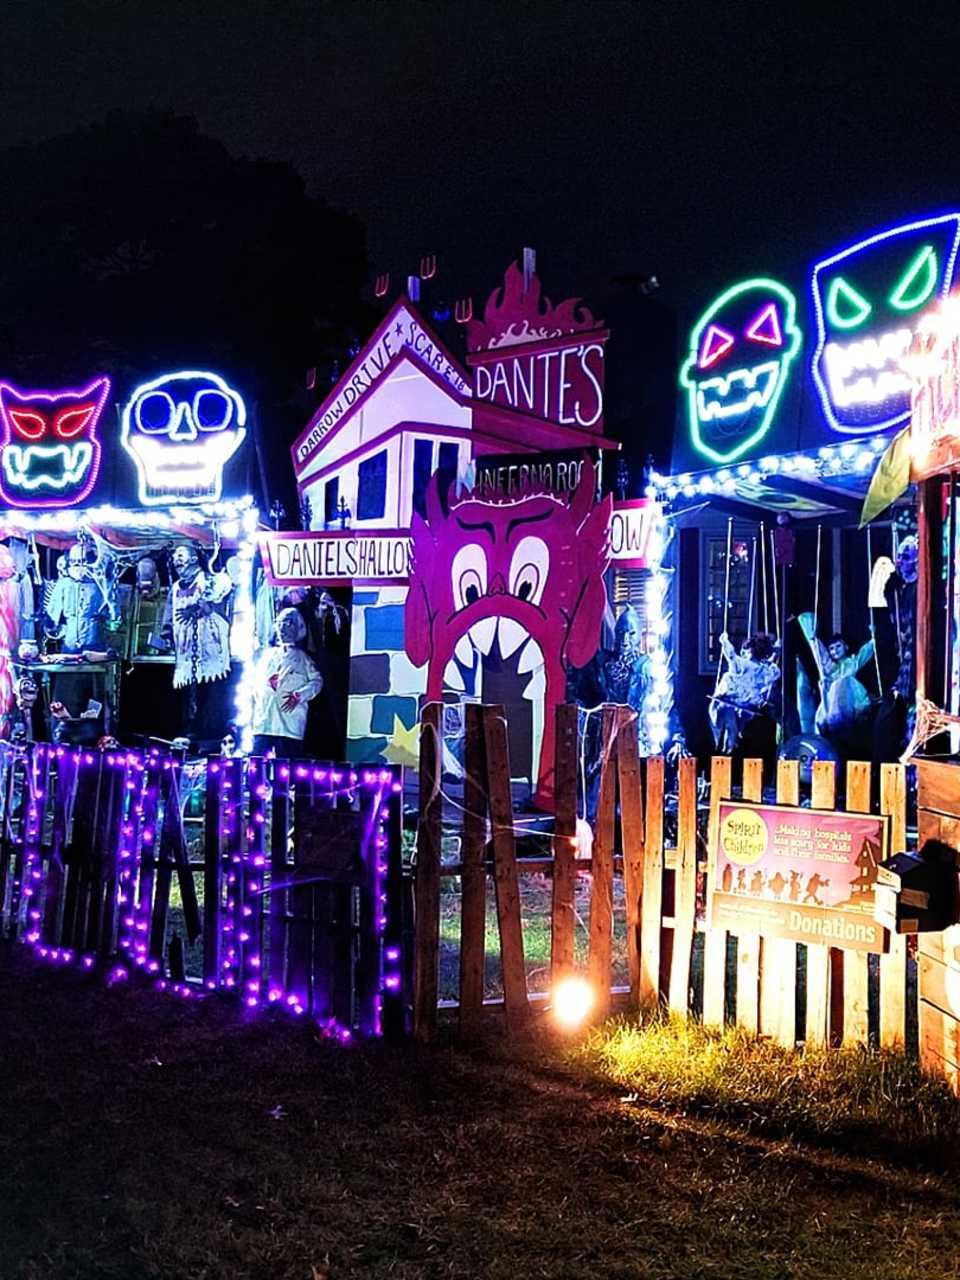 New ANIMATED HAUNTED MOVIE PROJECTOR Dancing Skeleton Halloween Prop Decoration